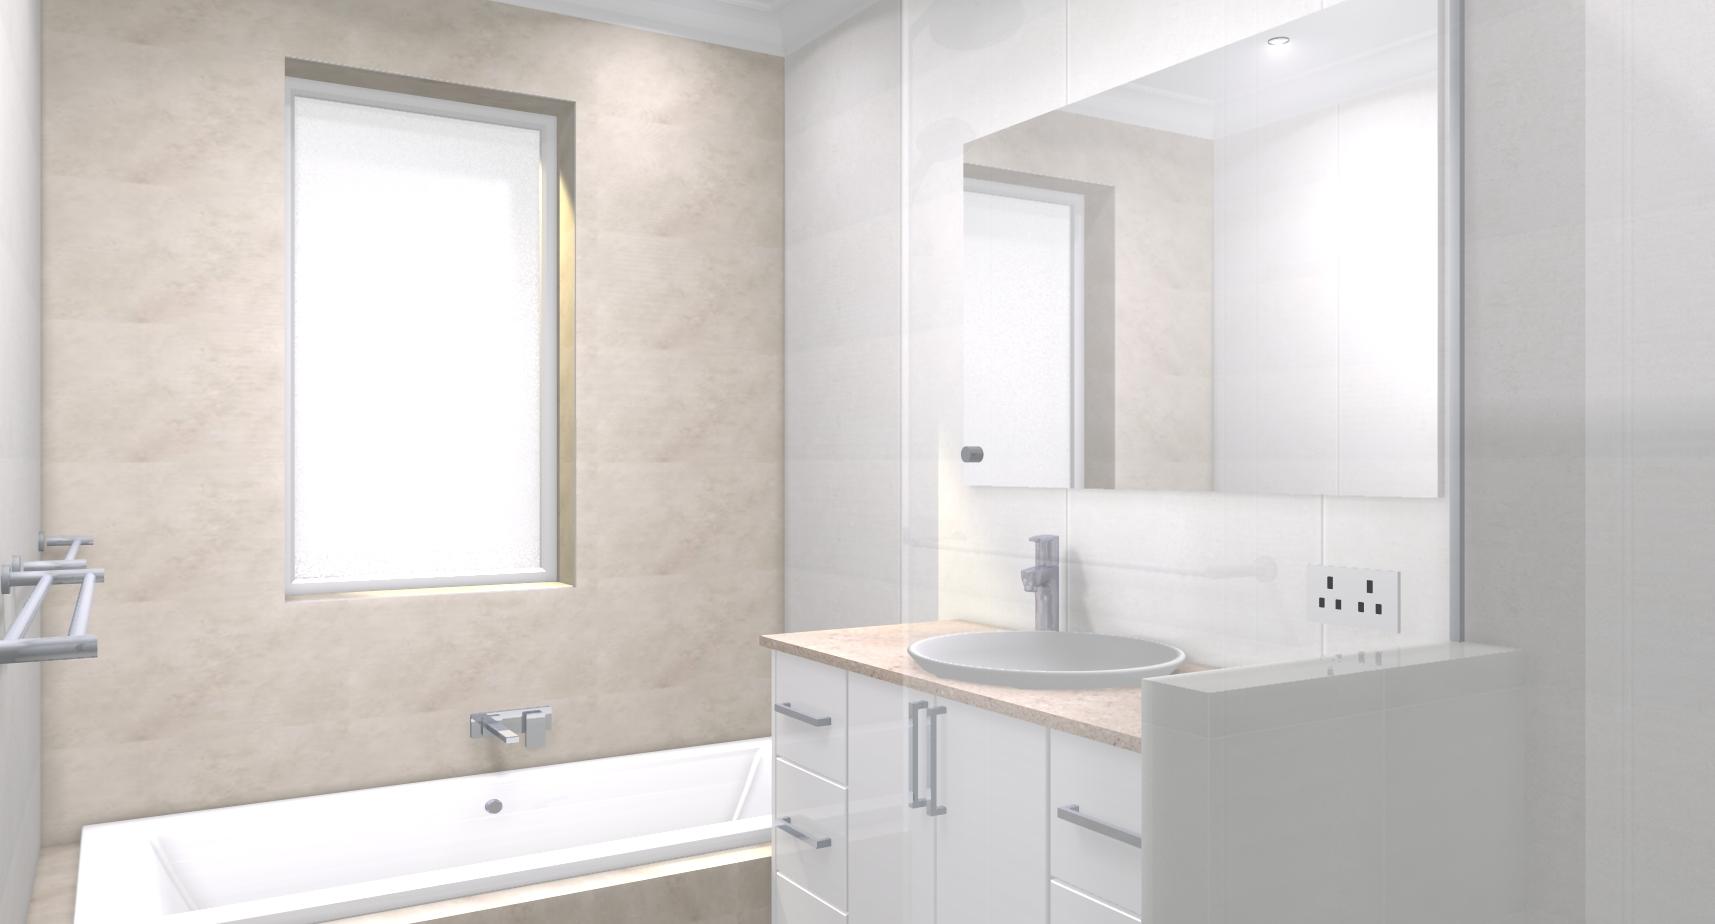 Leanne ray p bathroom bathroom renovations perth for Bathroom renovations 3d